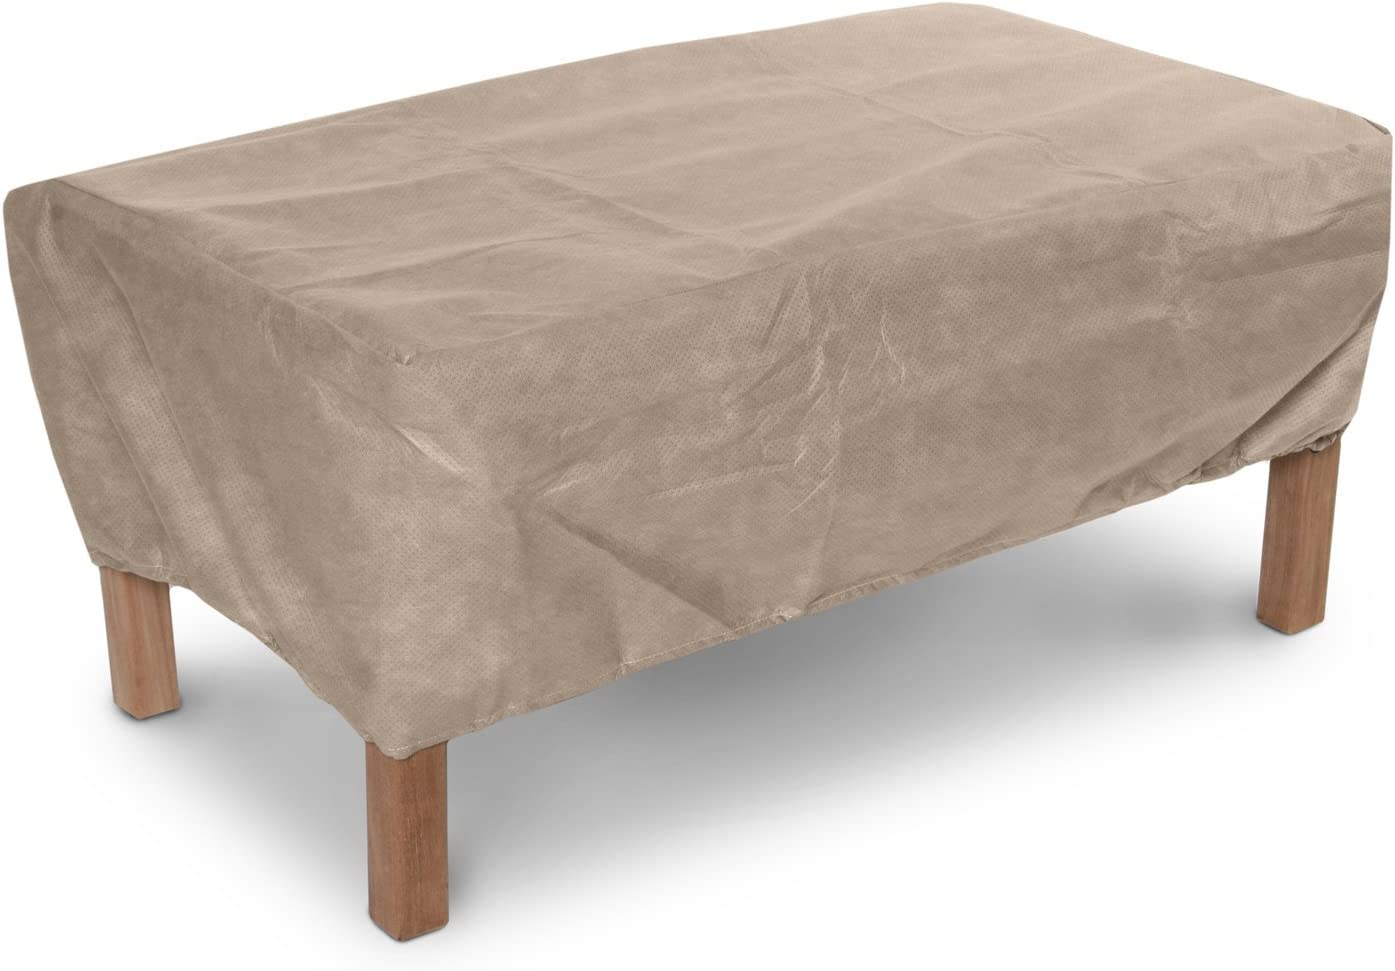 "B0075BU7S2 KOVERROOS 42"" x 30"" Ottoman/Small Table Cover 71NMijfv2BNL"